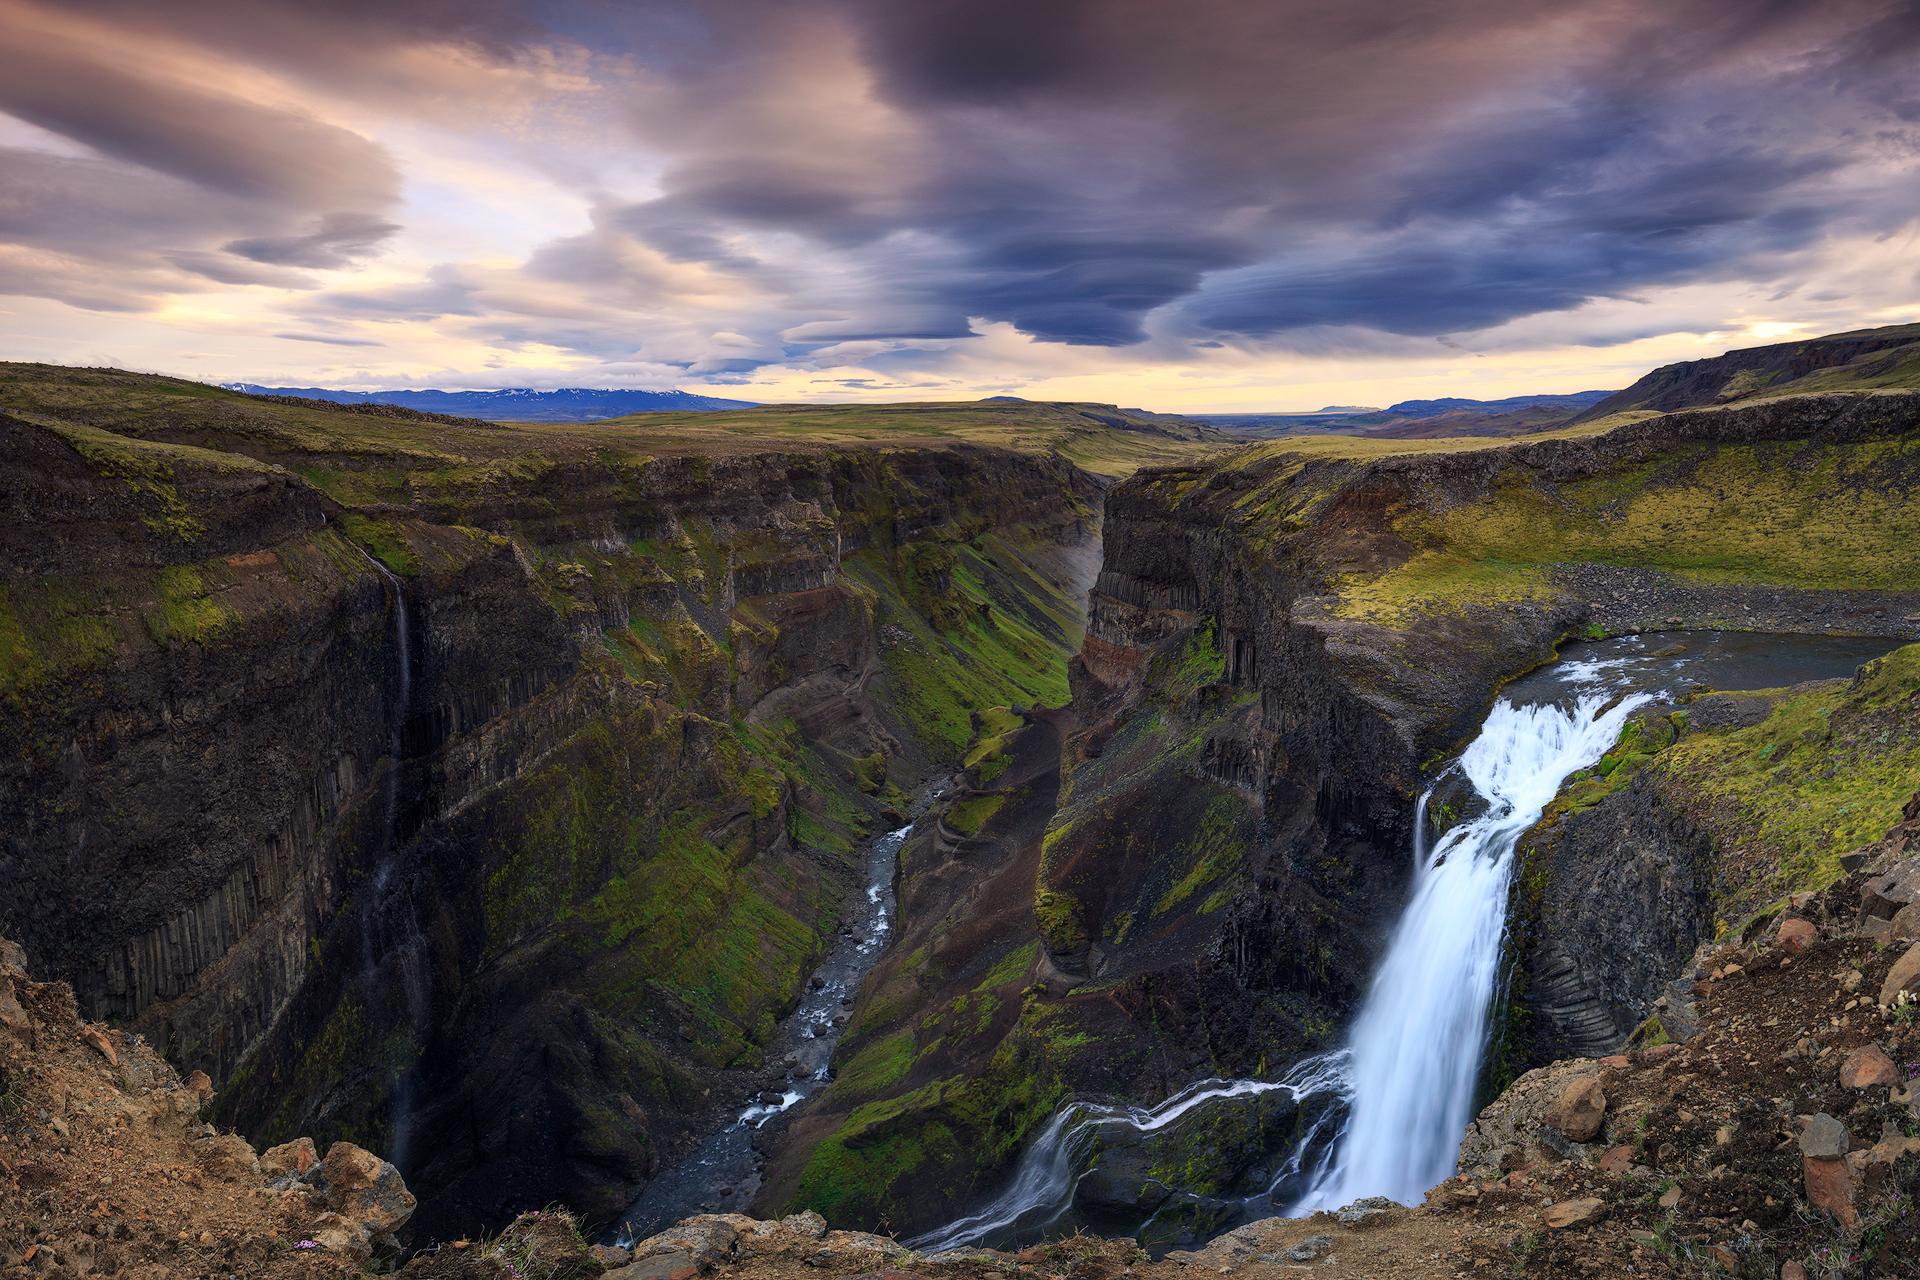 (Haifoss area, Iceland)